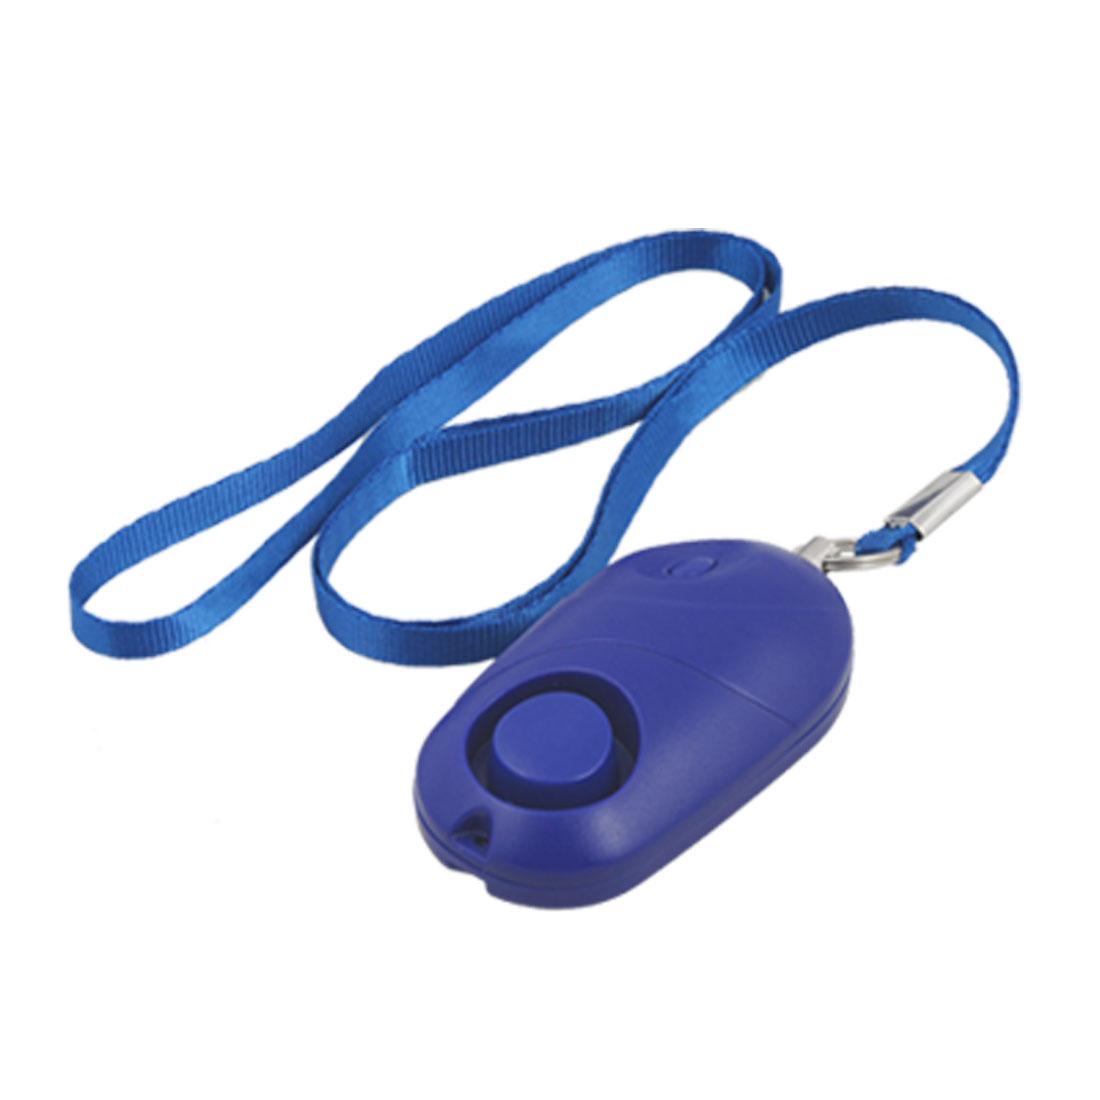 LED Light Handbag Purse Blue Personal Mini Pull Cord Alarm